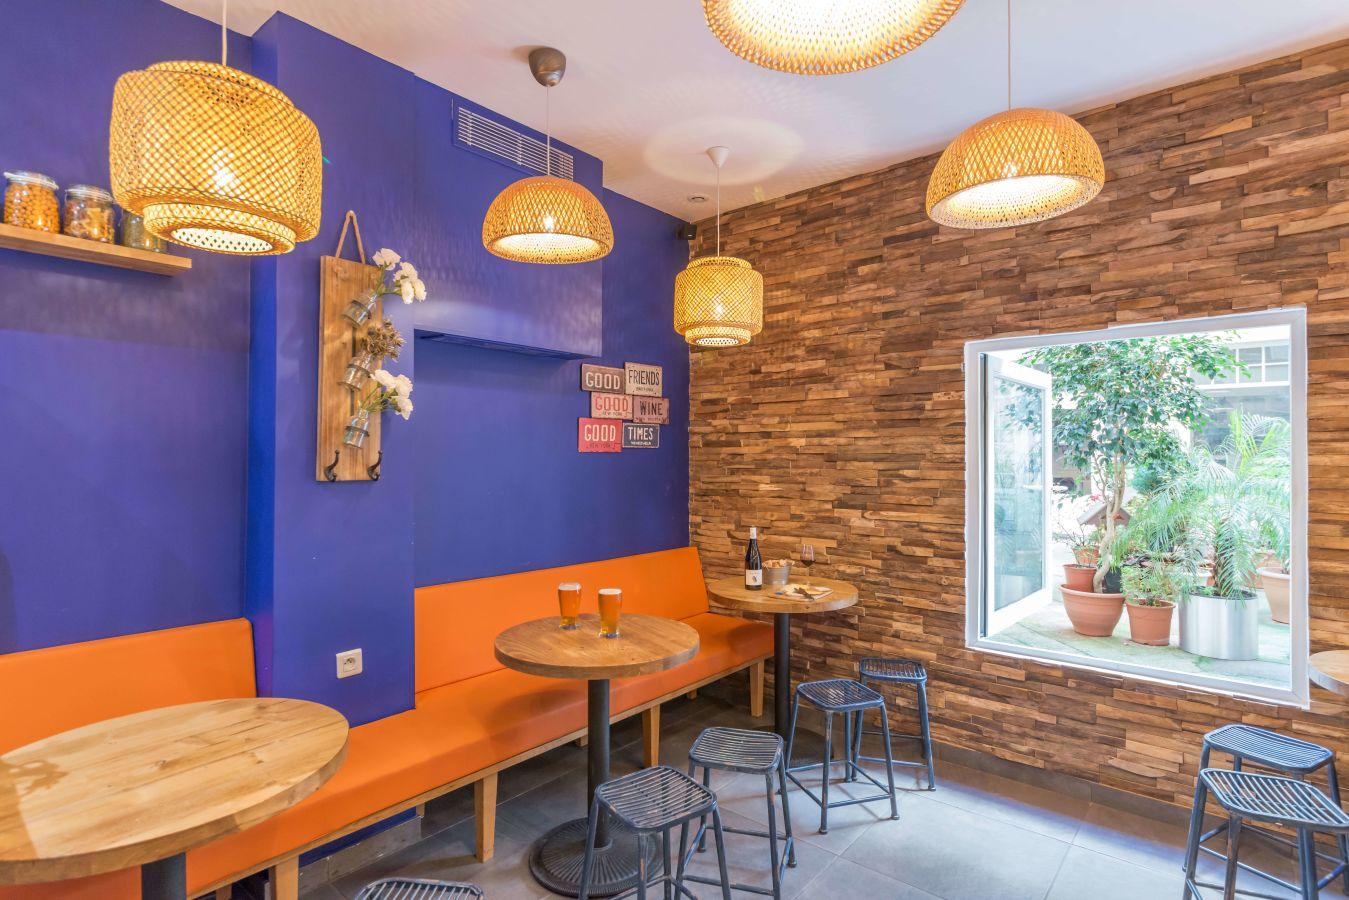 Photo 1 du restaurant Memento